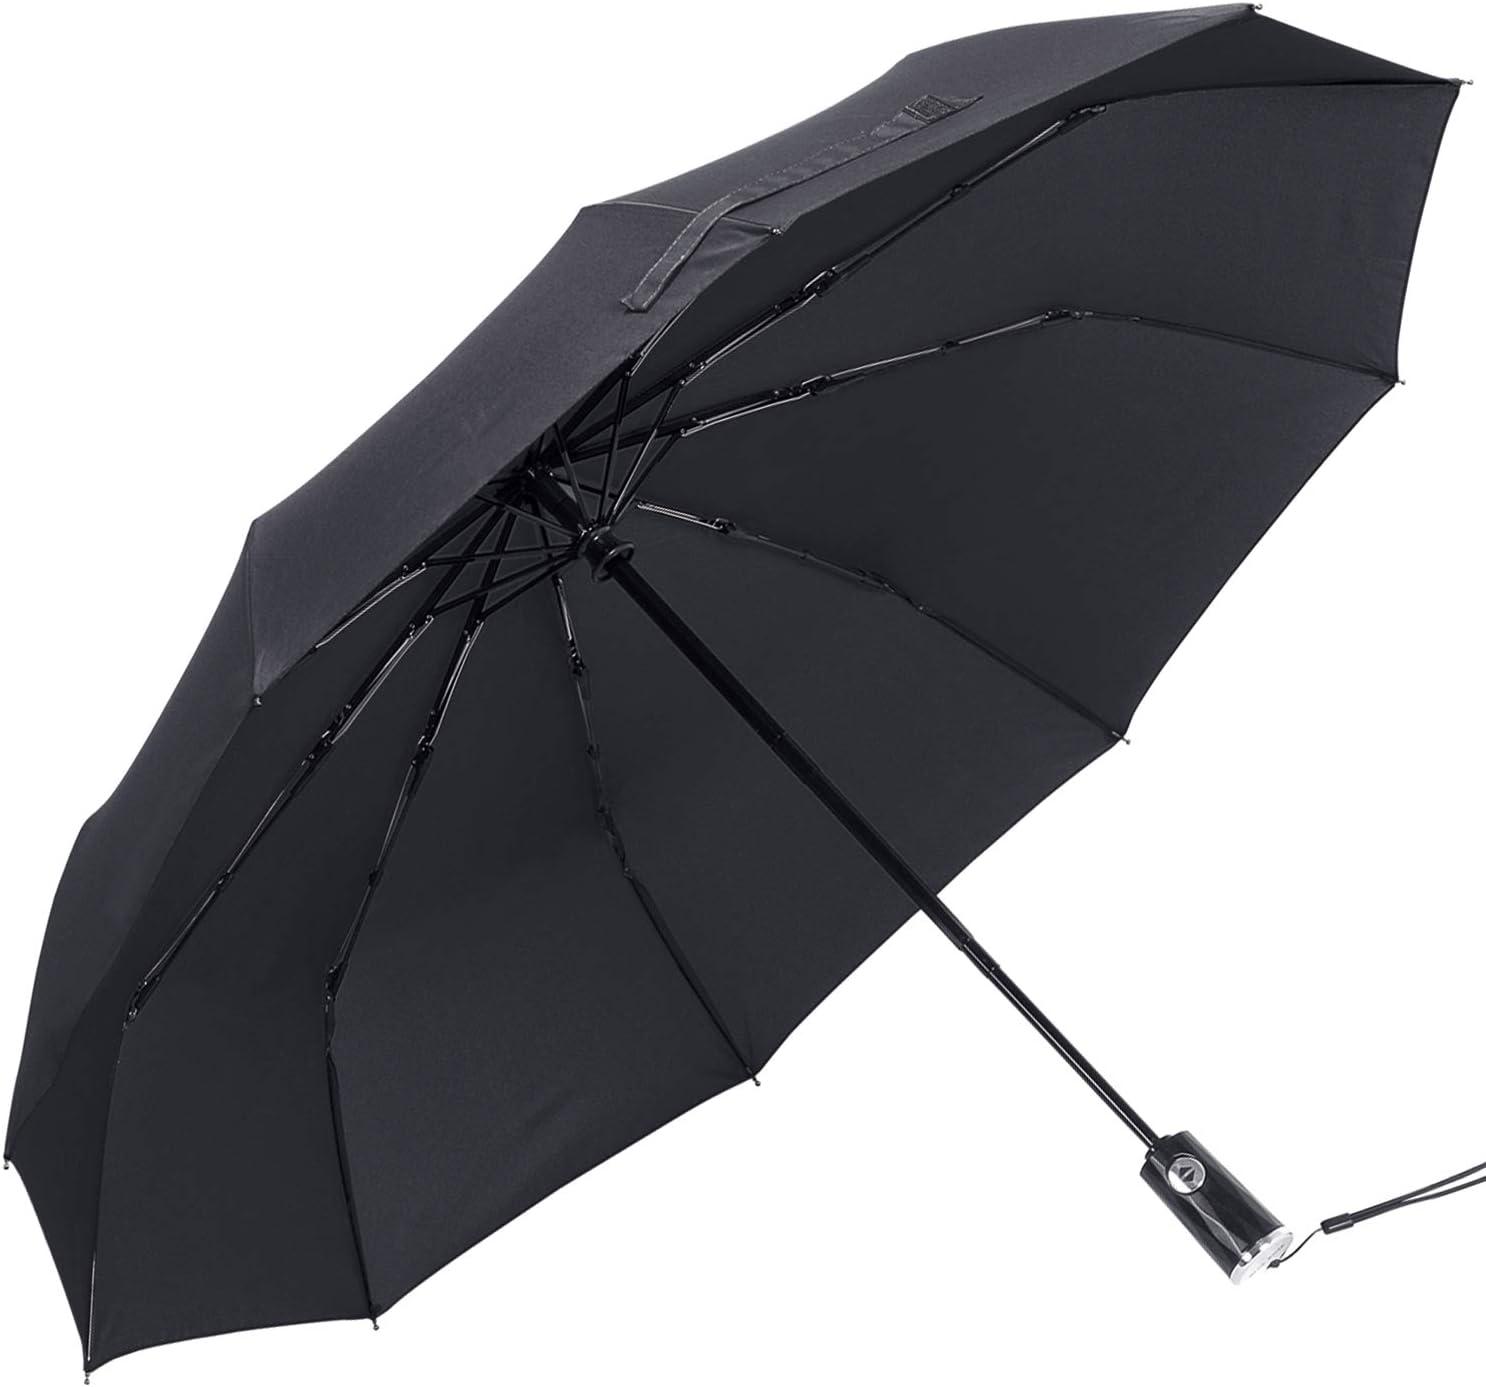 BLUEROSE Compact Umbrella 10 Ribs Auto Open//Close Travel Umbrella Windproof Lightweight Umbrellas for Rain